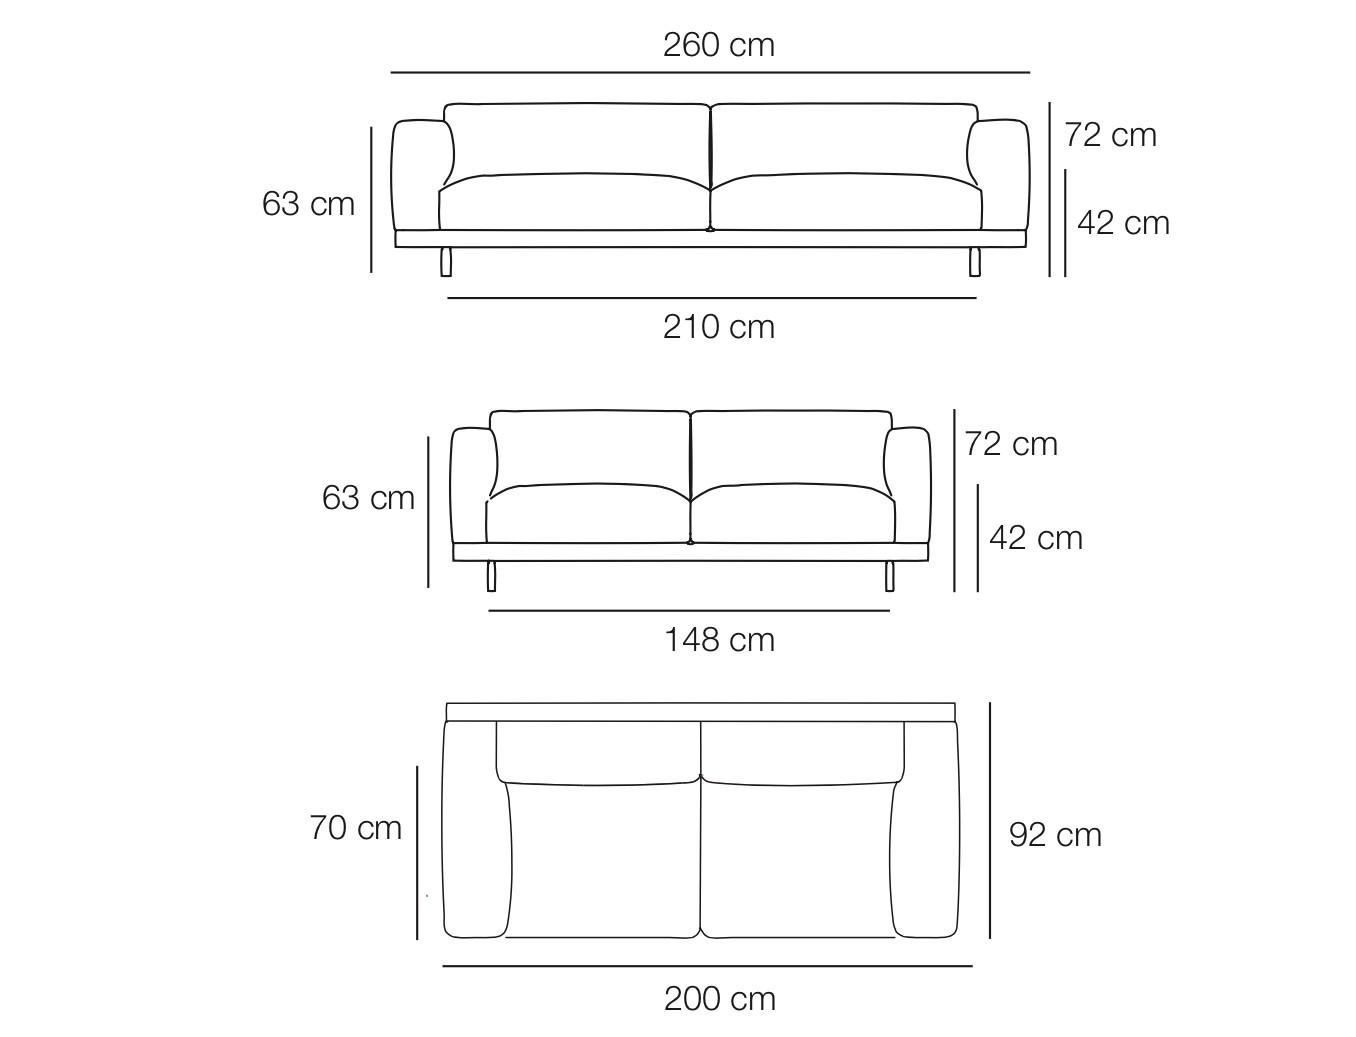 standard sofa sizes in mm la sofateria opiniones dimensions sofas memsaheb thesofa